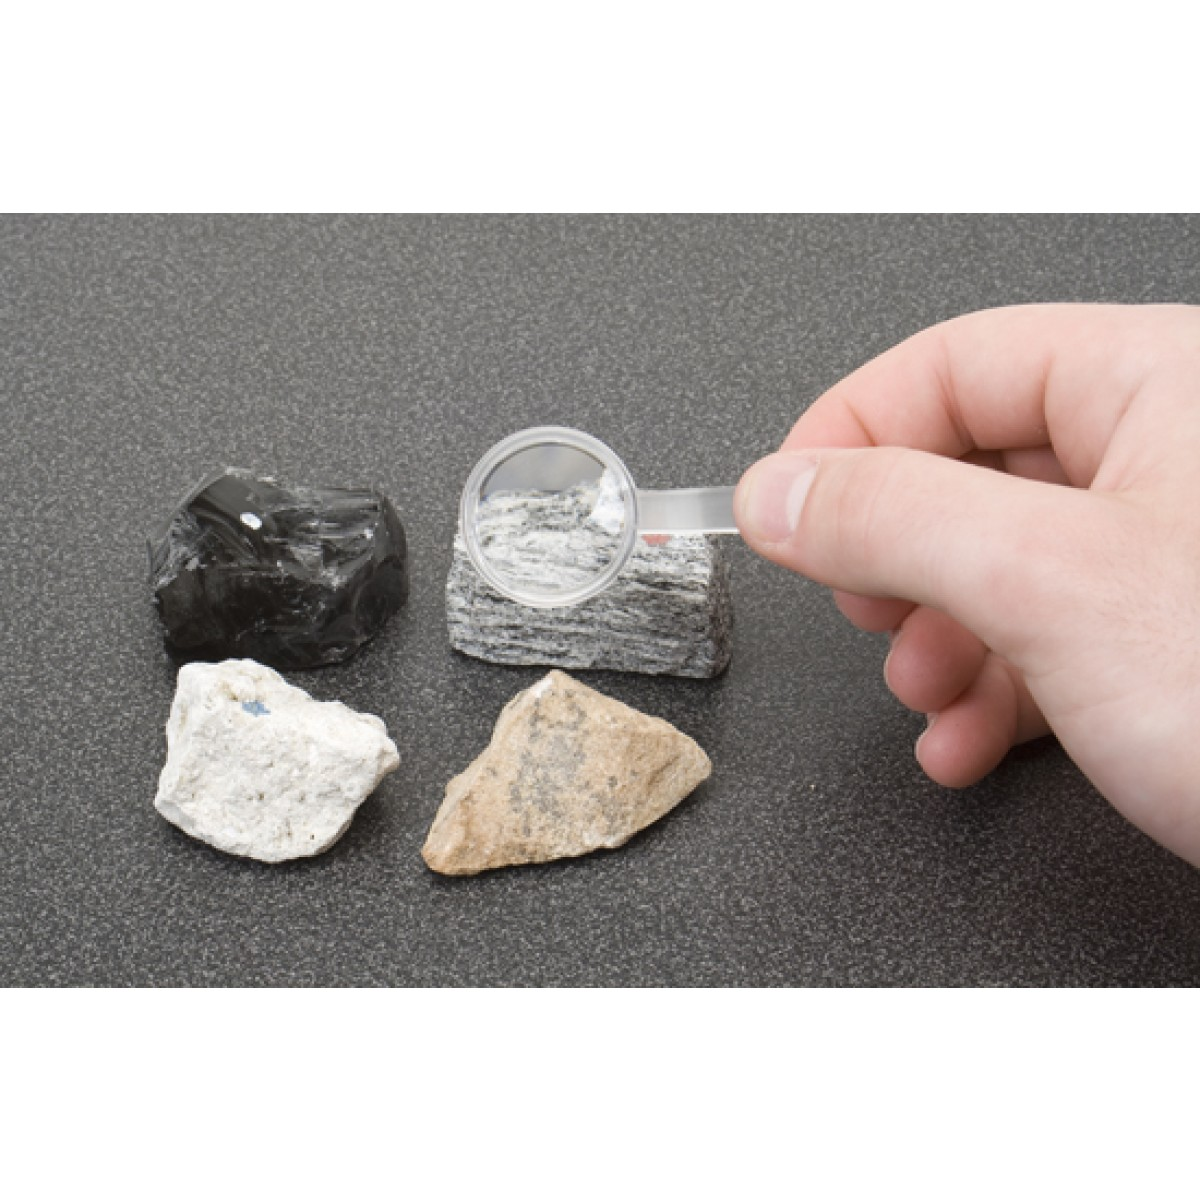 Classifying Sedimentary Igneous And Metamorphic Rocks